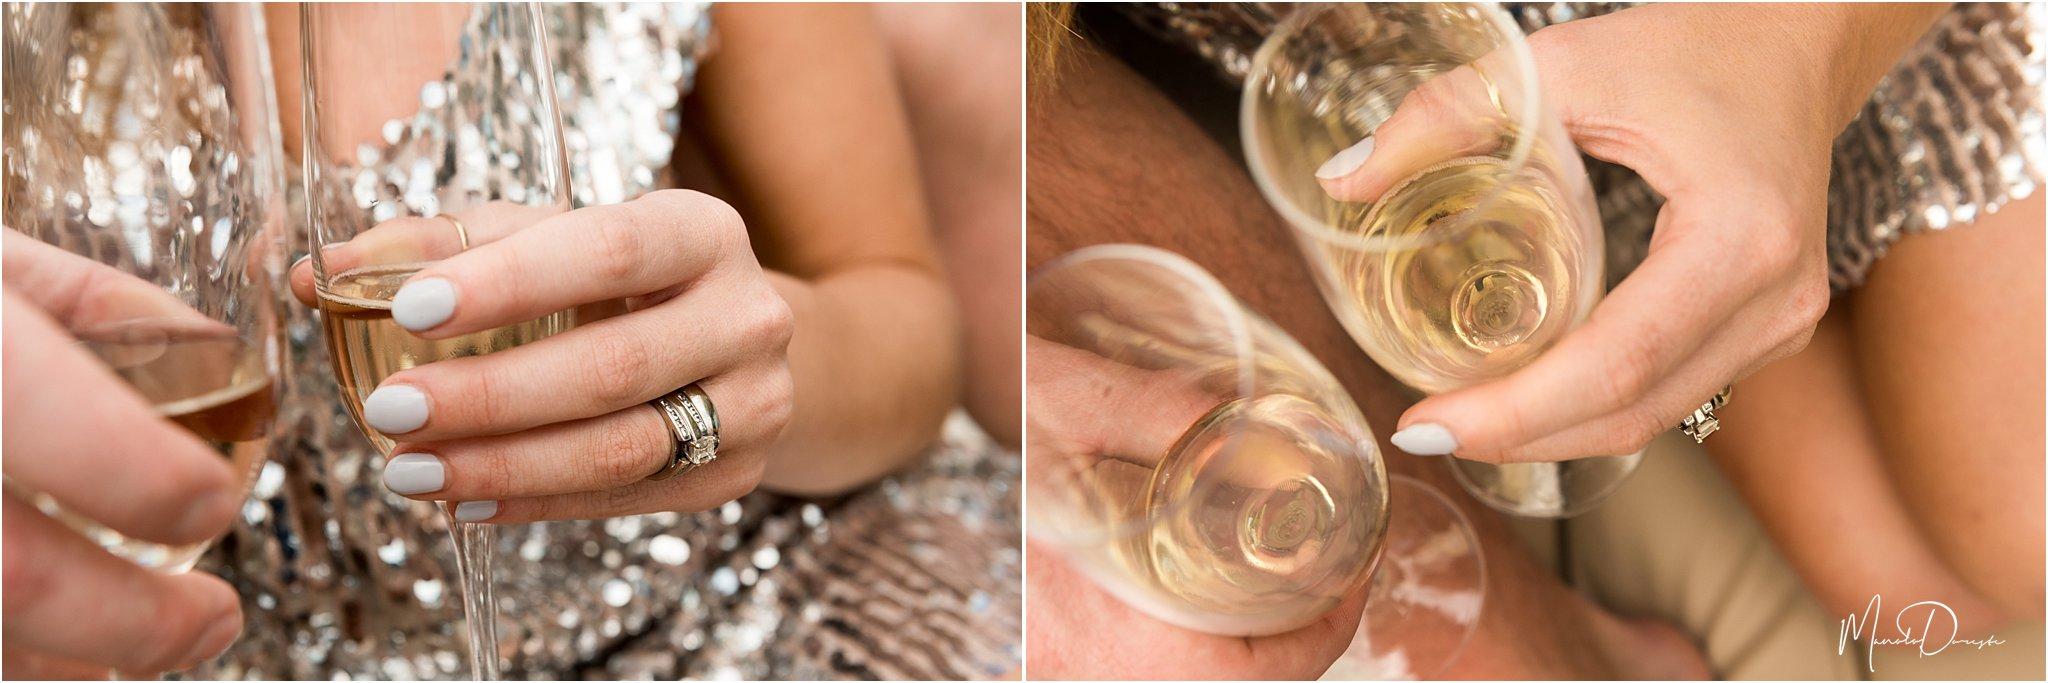 00903_ManoloDoreste_InFocusStudios_Wedding_Family_Photography_Miami_MiamiPhotographer.jpg